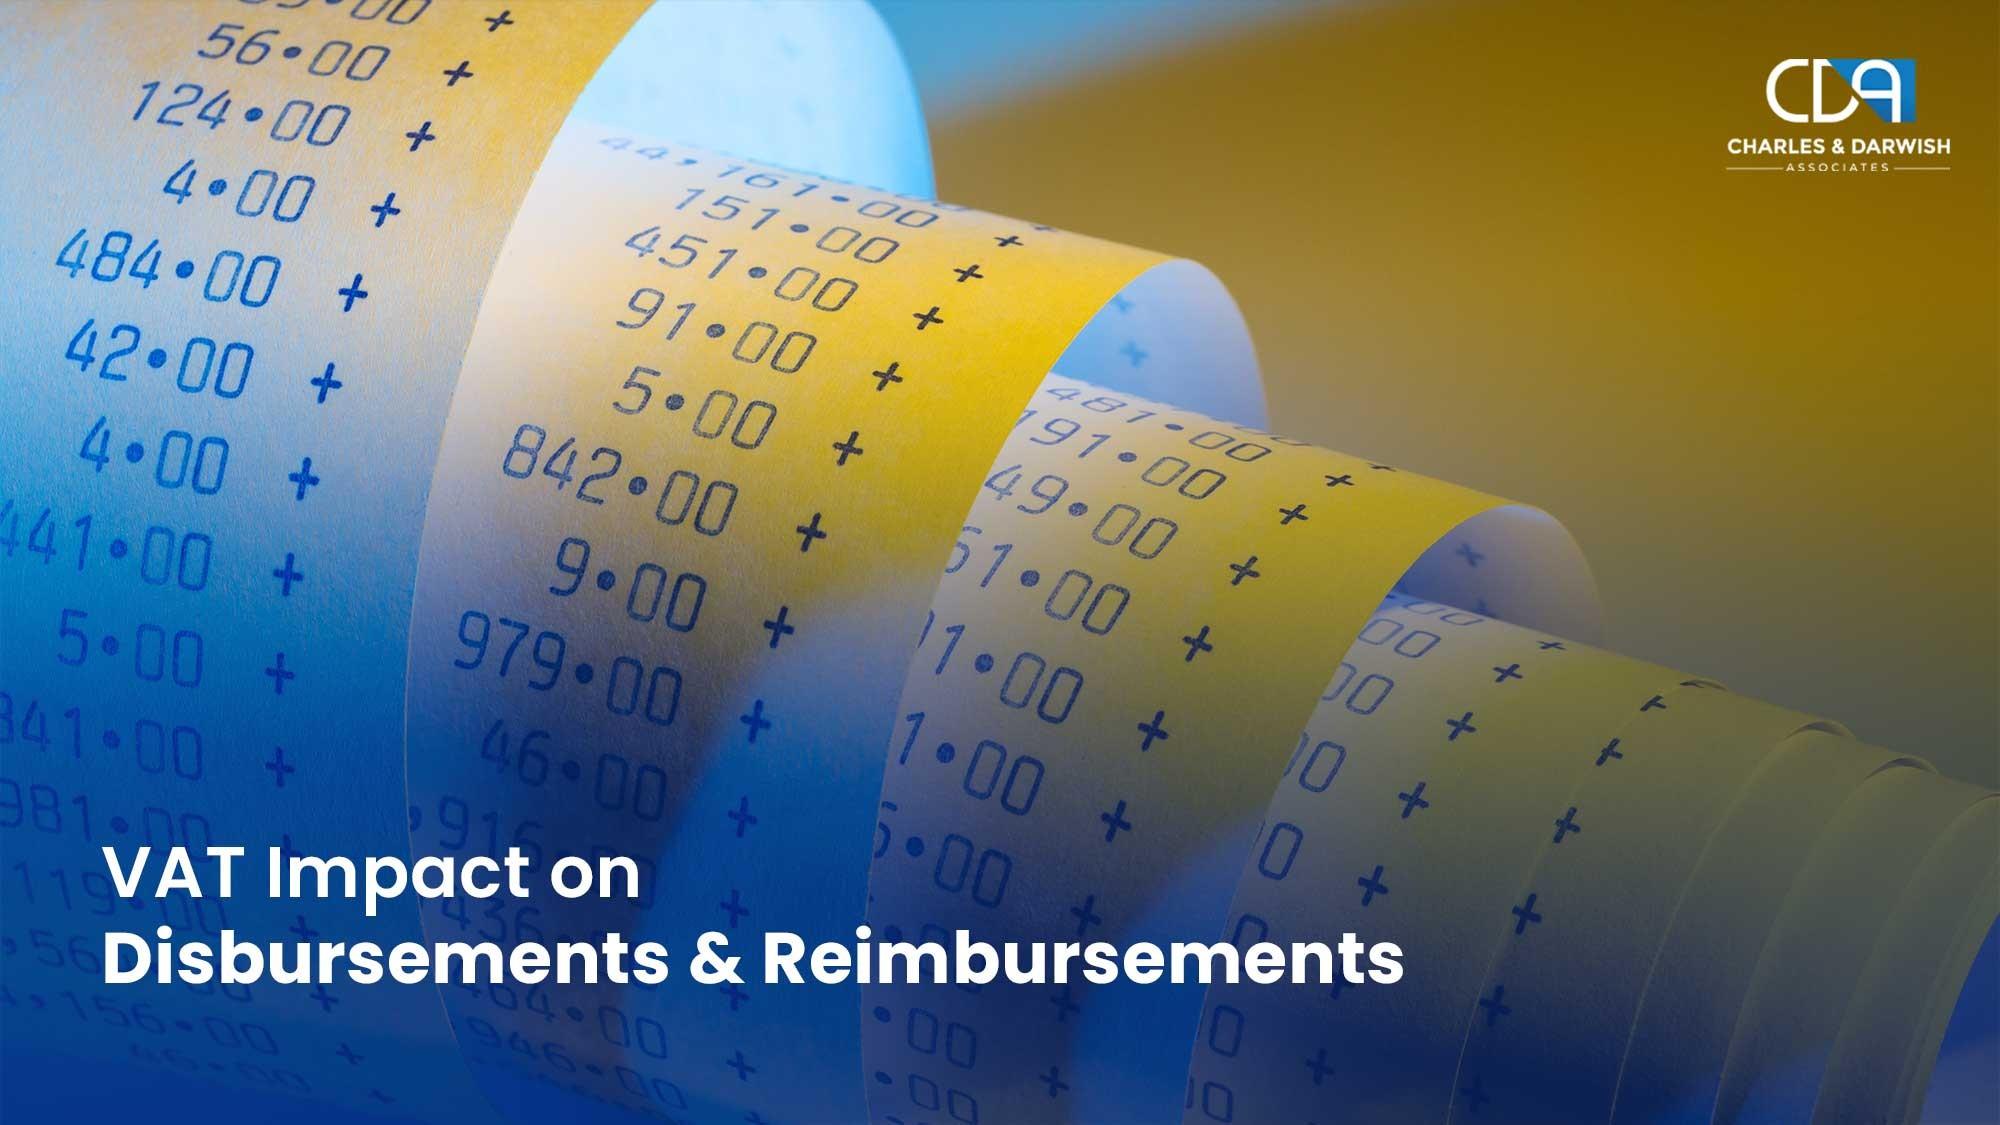 Vat Impact On Disbursements And Reimbursements